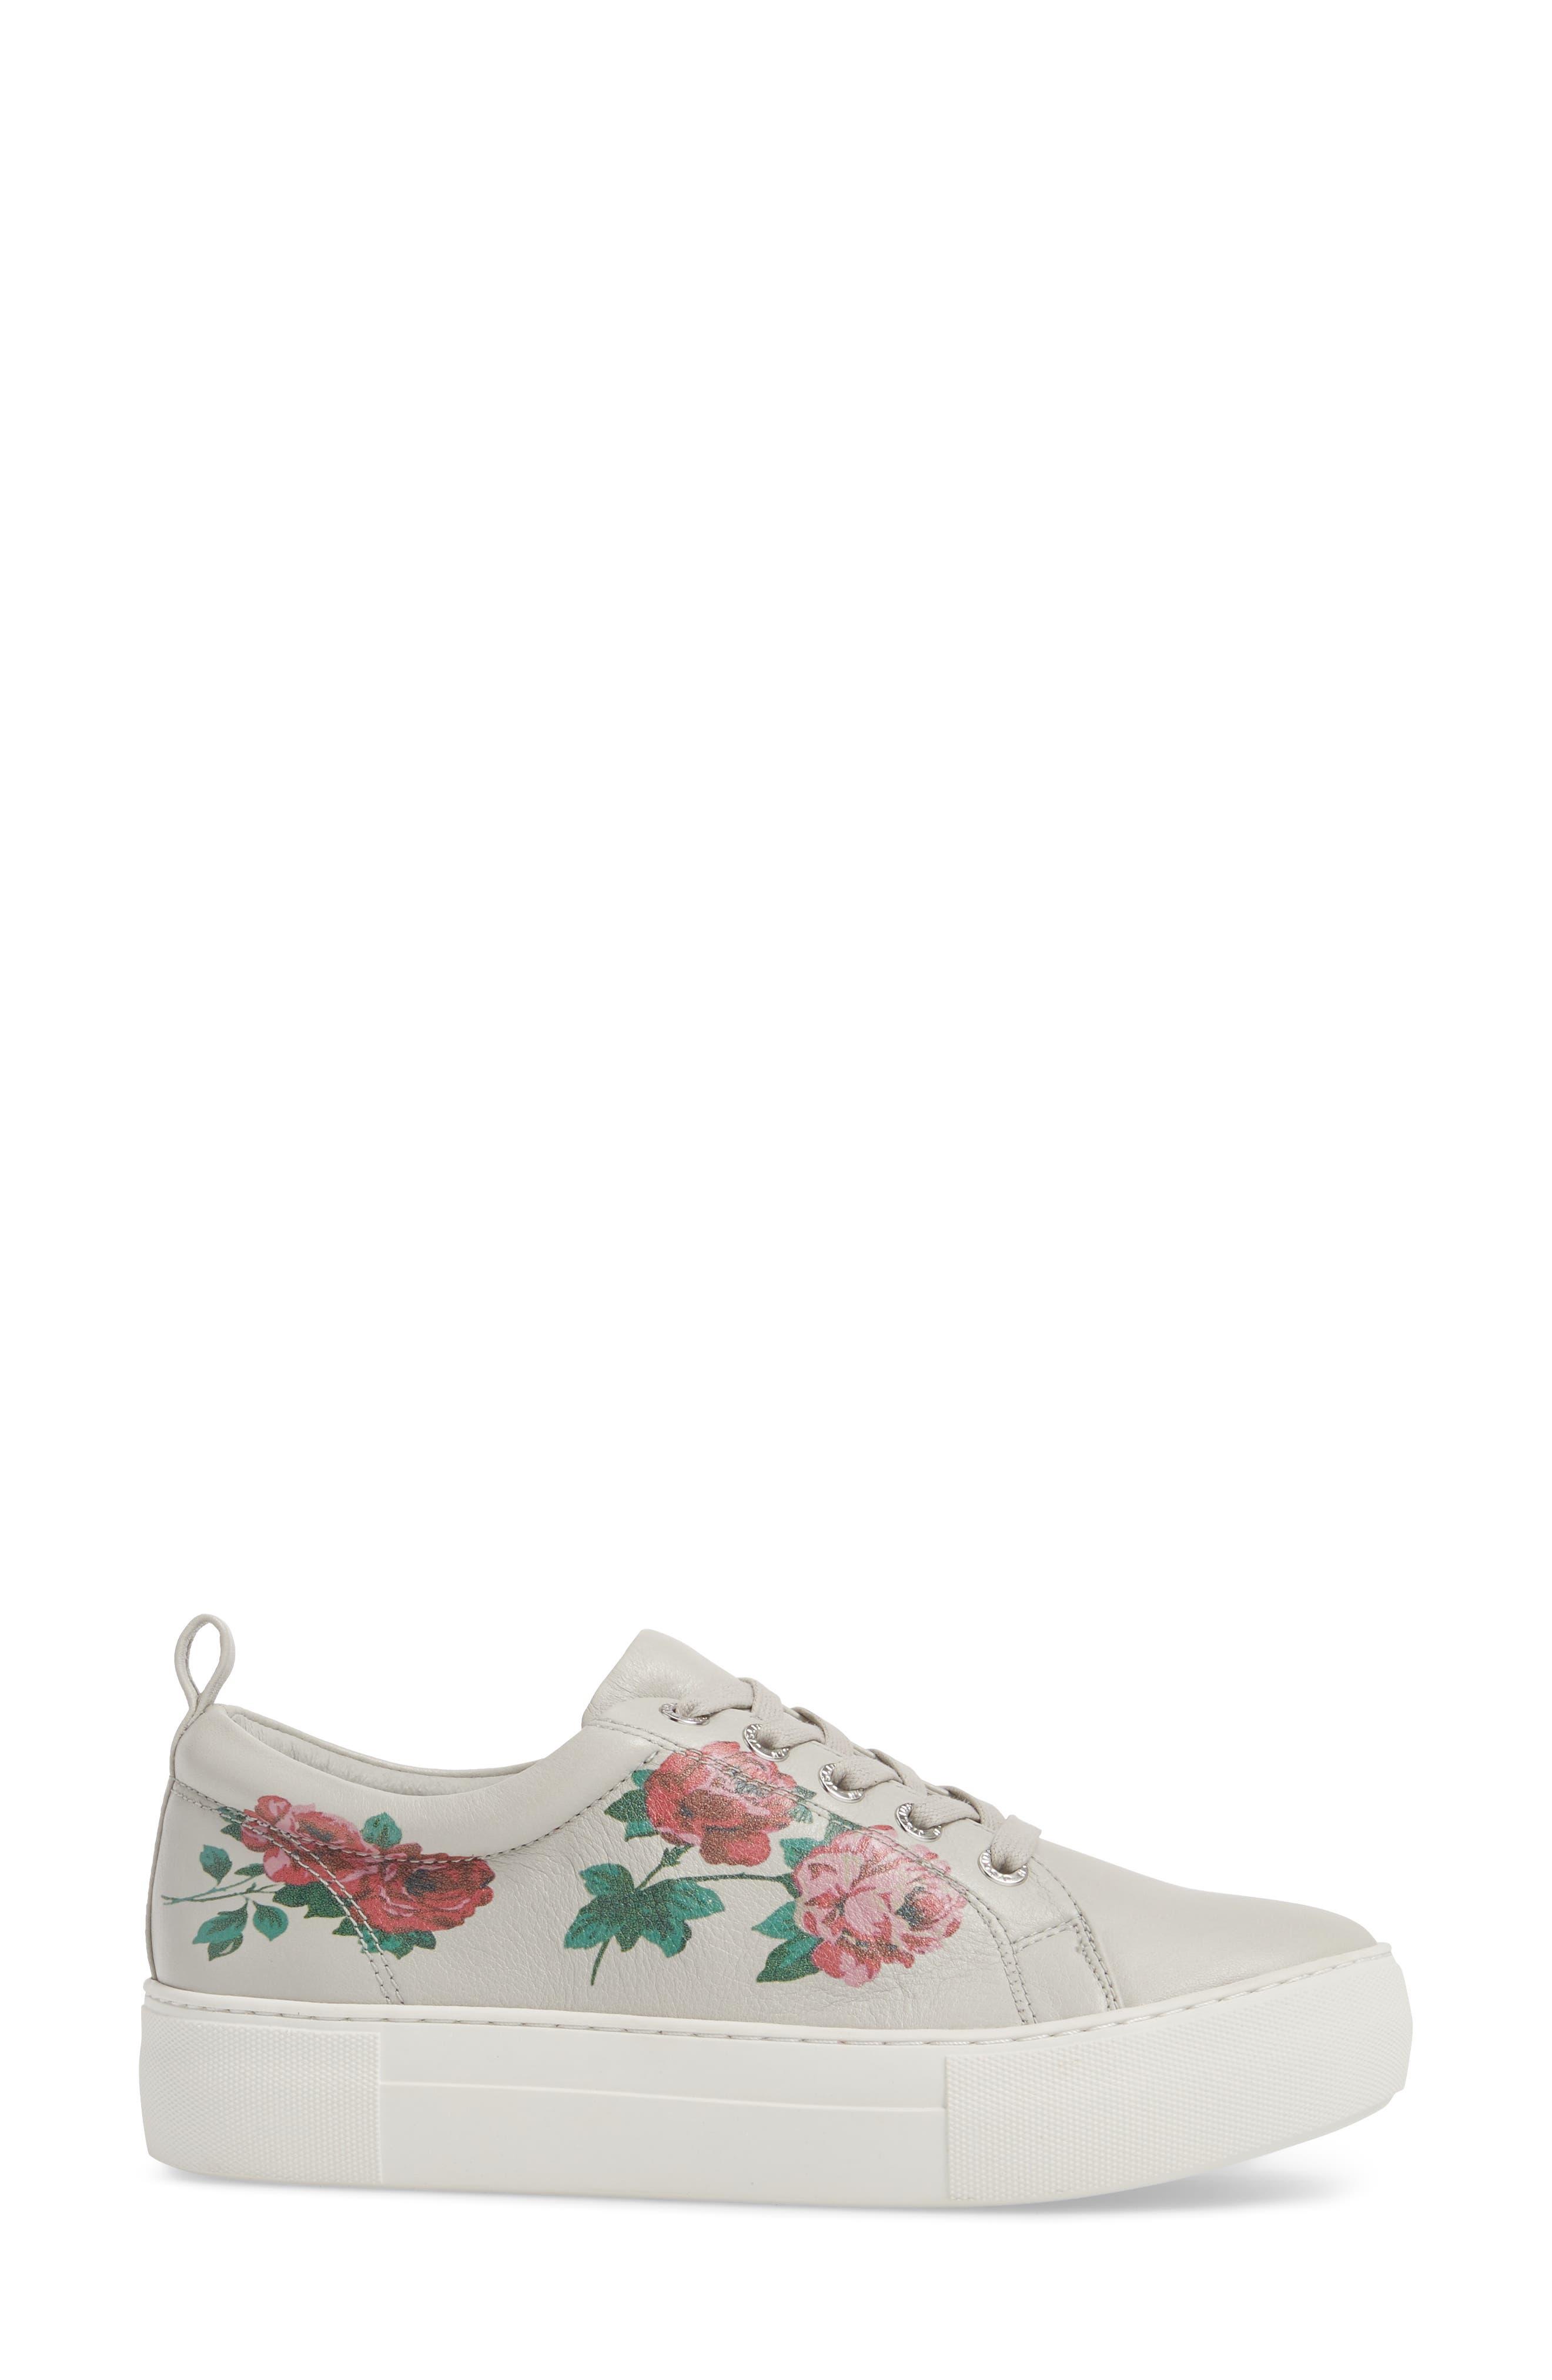 Adel Floral Sneaker,                             Alternate thumbnail 3, color,                             Light Grey Leather